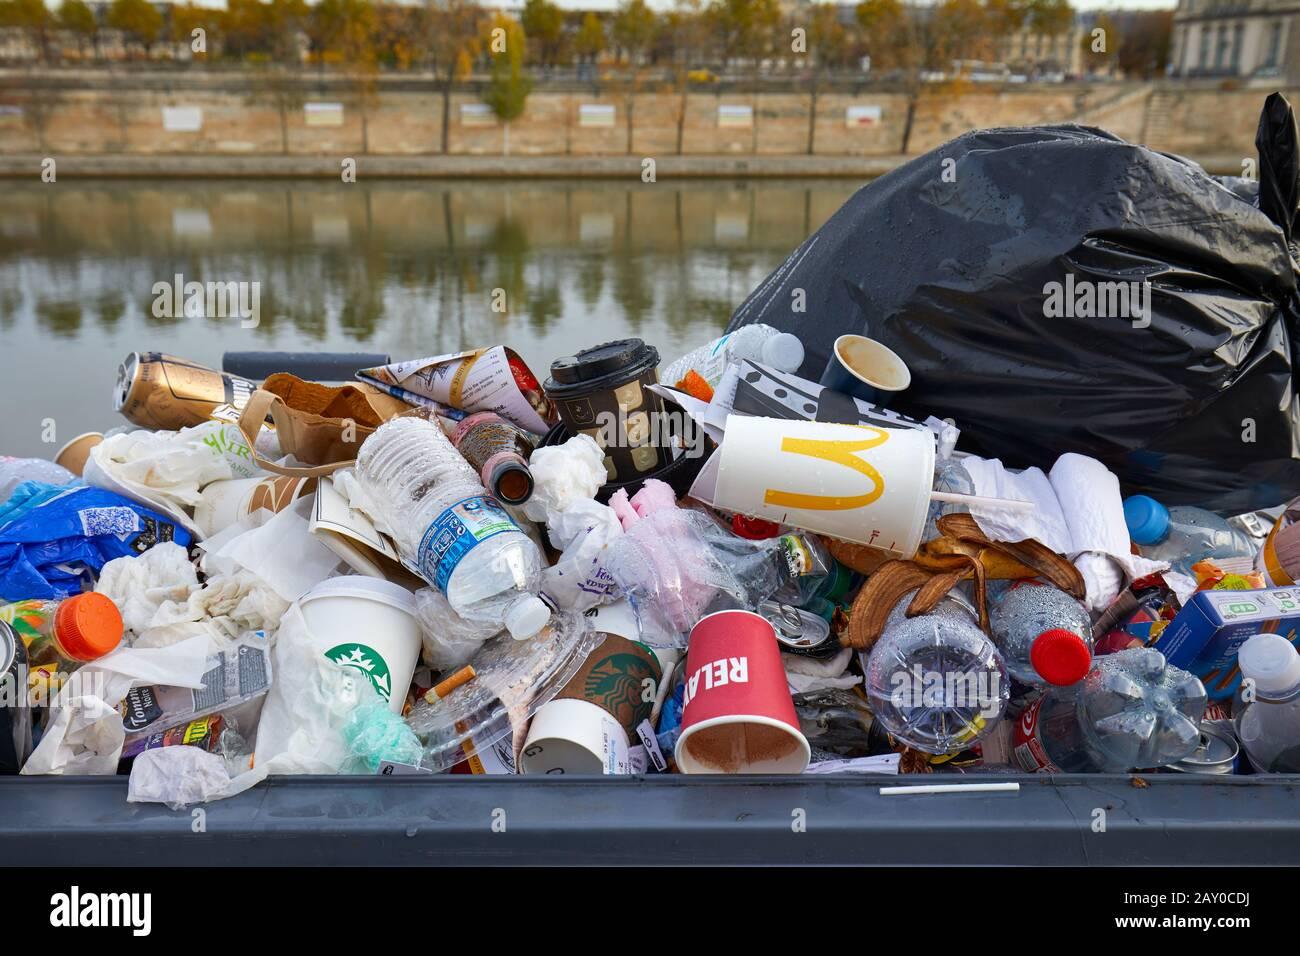 PARIS - NOVEMBER 8, 2019: Full garbage basket with colorful rubbish in Paris Stock Photo